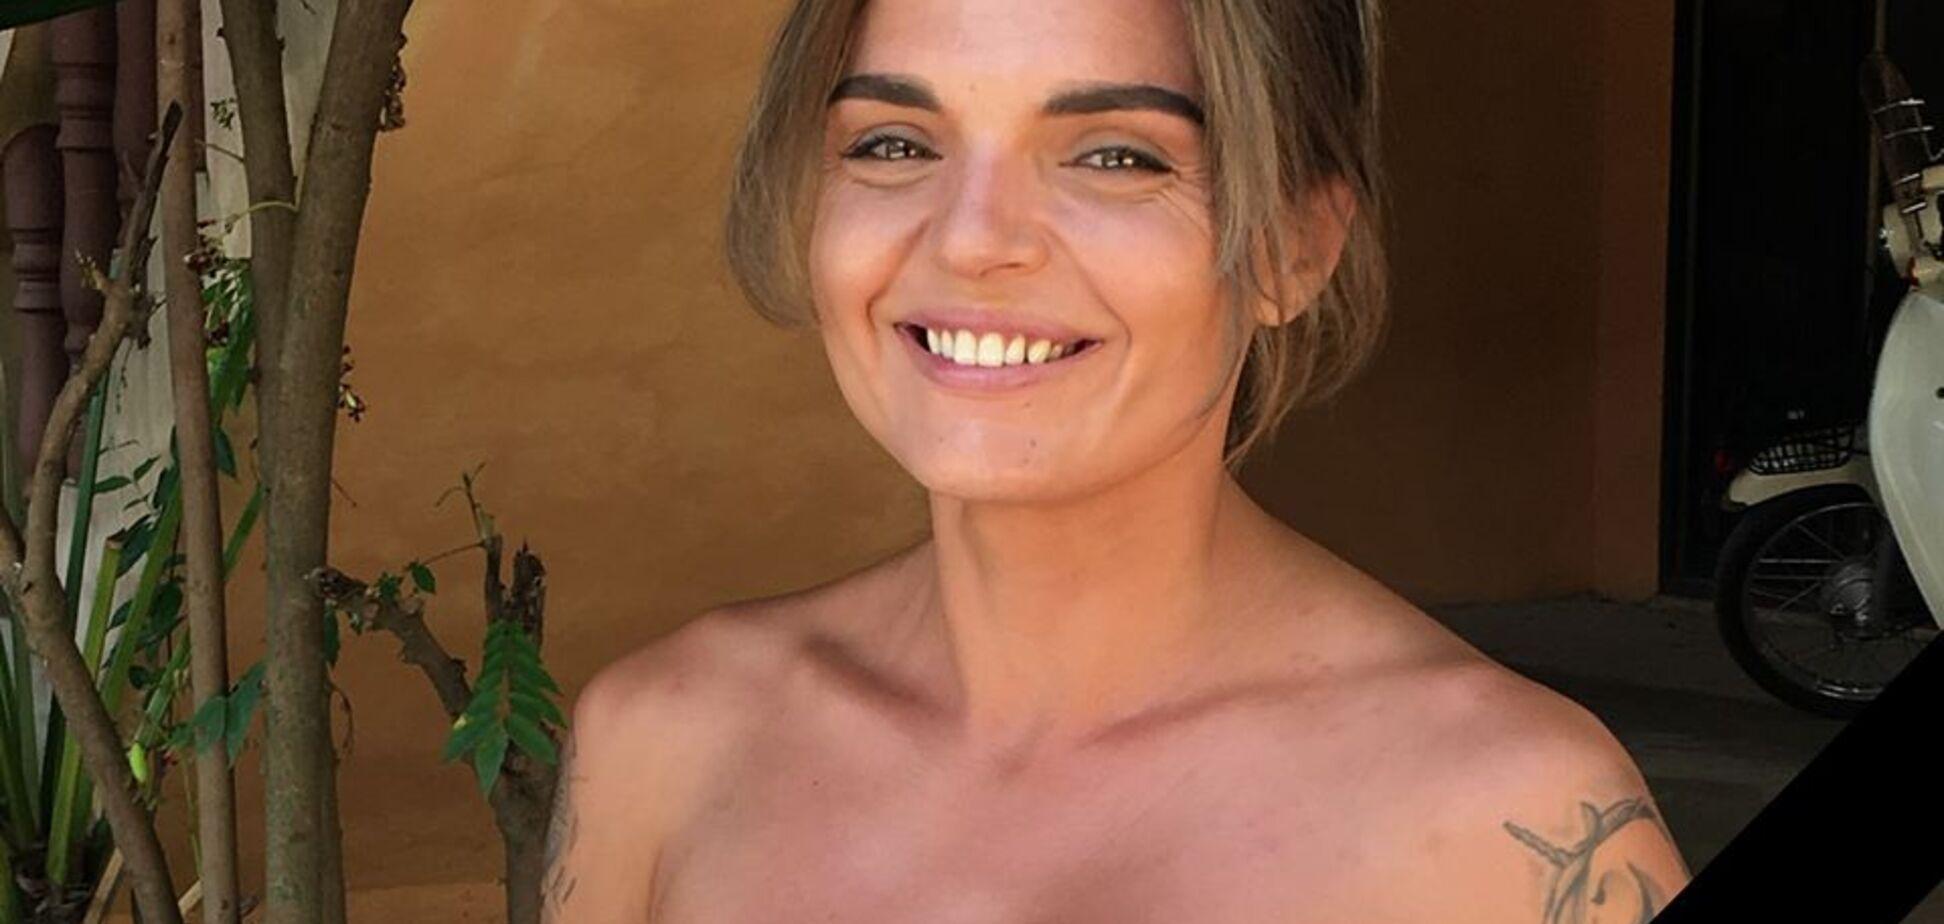 Журналистка Ольга Фролова могла совершить суицид